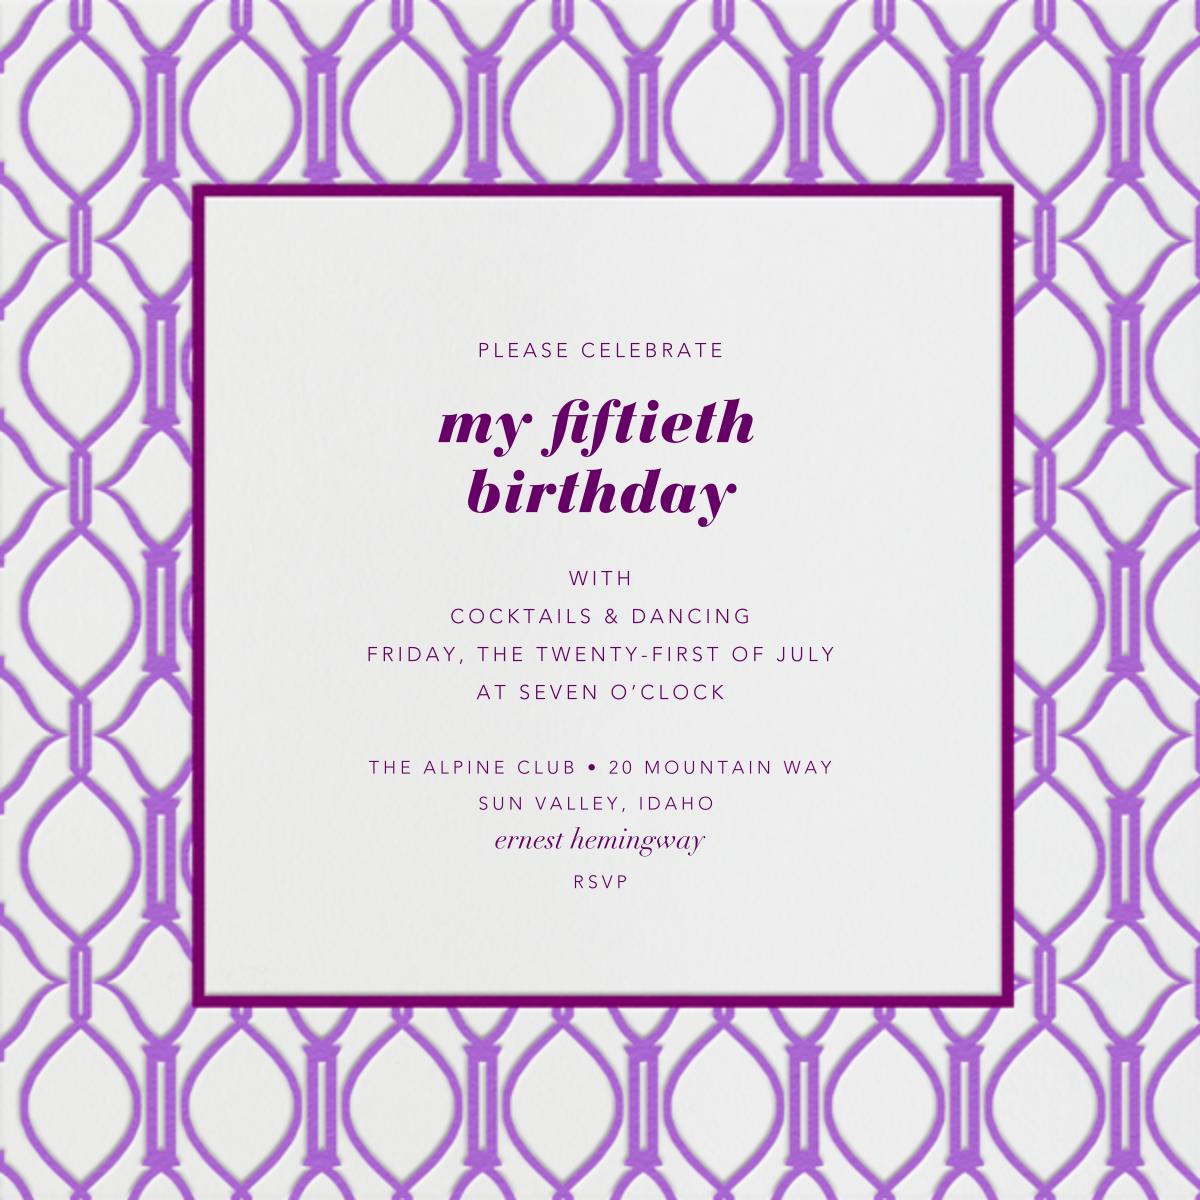 Cadogan Purple Square - Paperless Post - Adult birthday